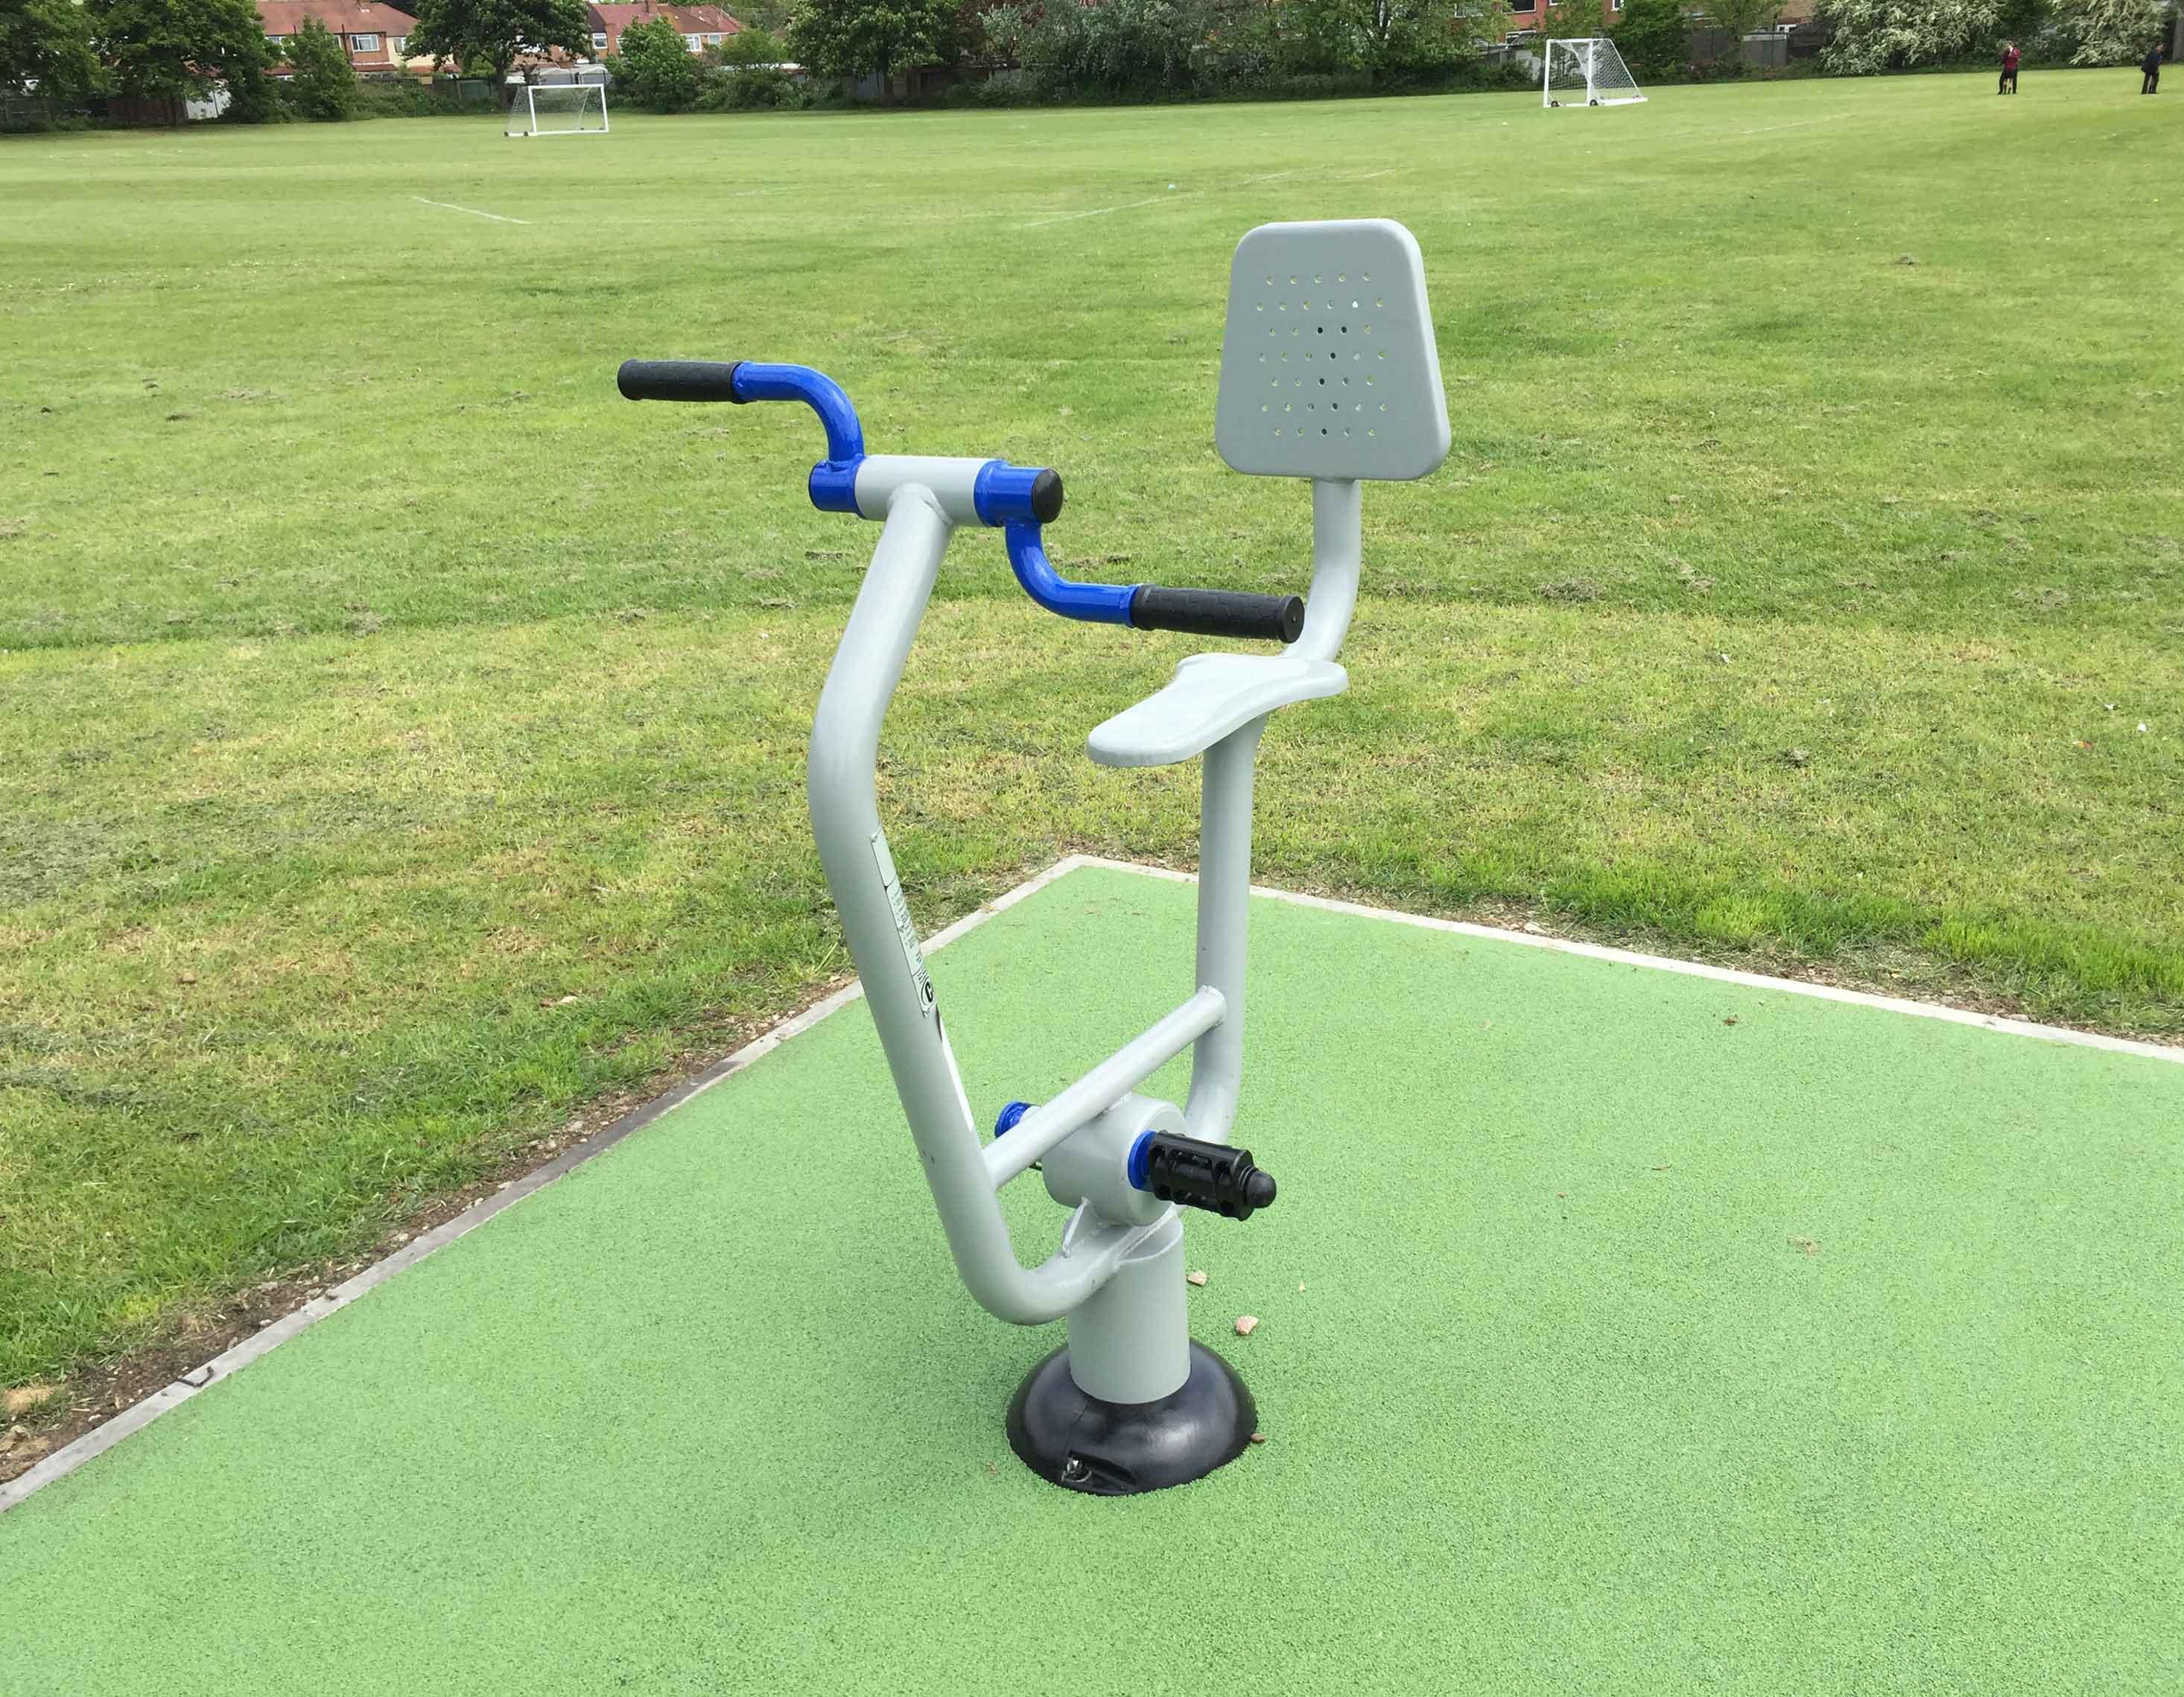 Outdoor Gym|Selborne Primary School Outdoor Gym Equipment ...